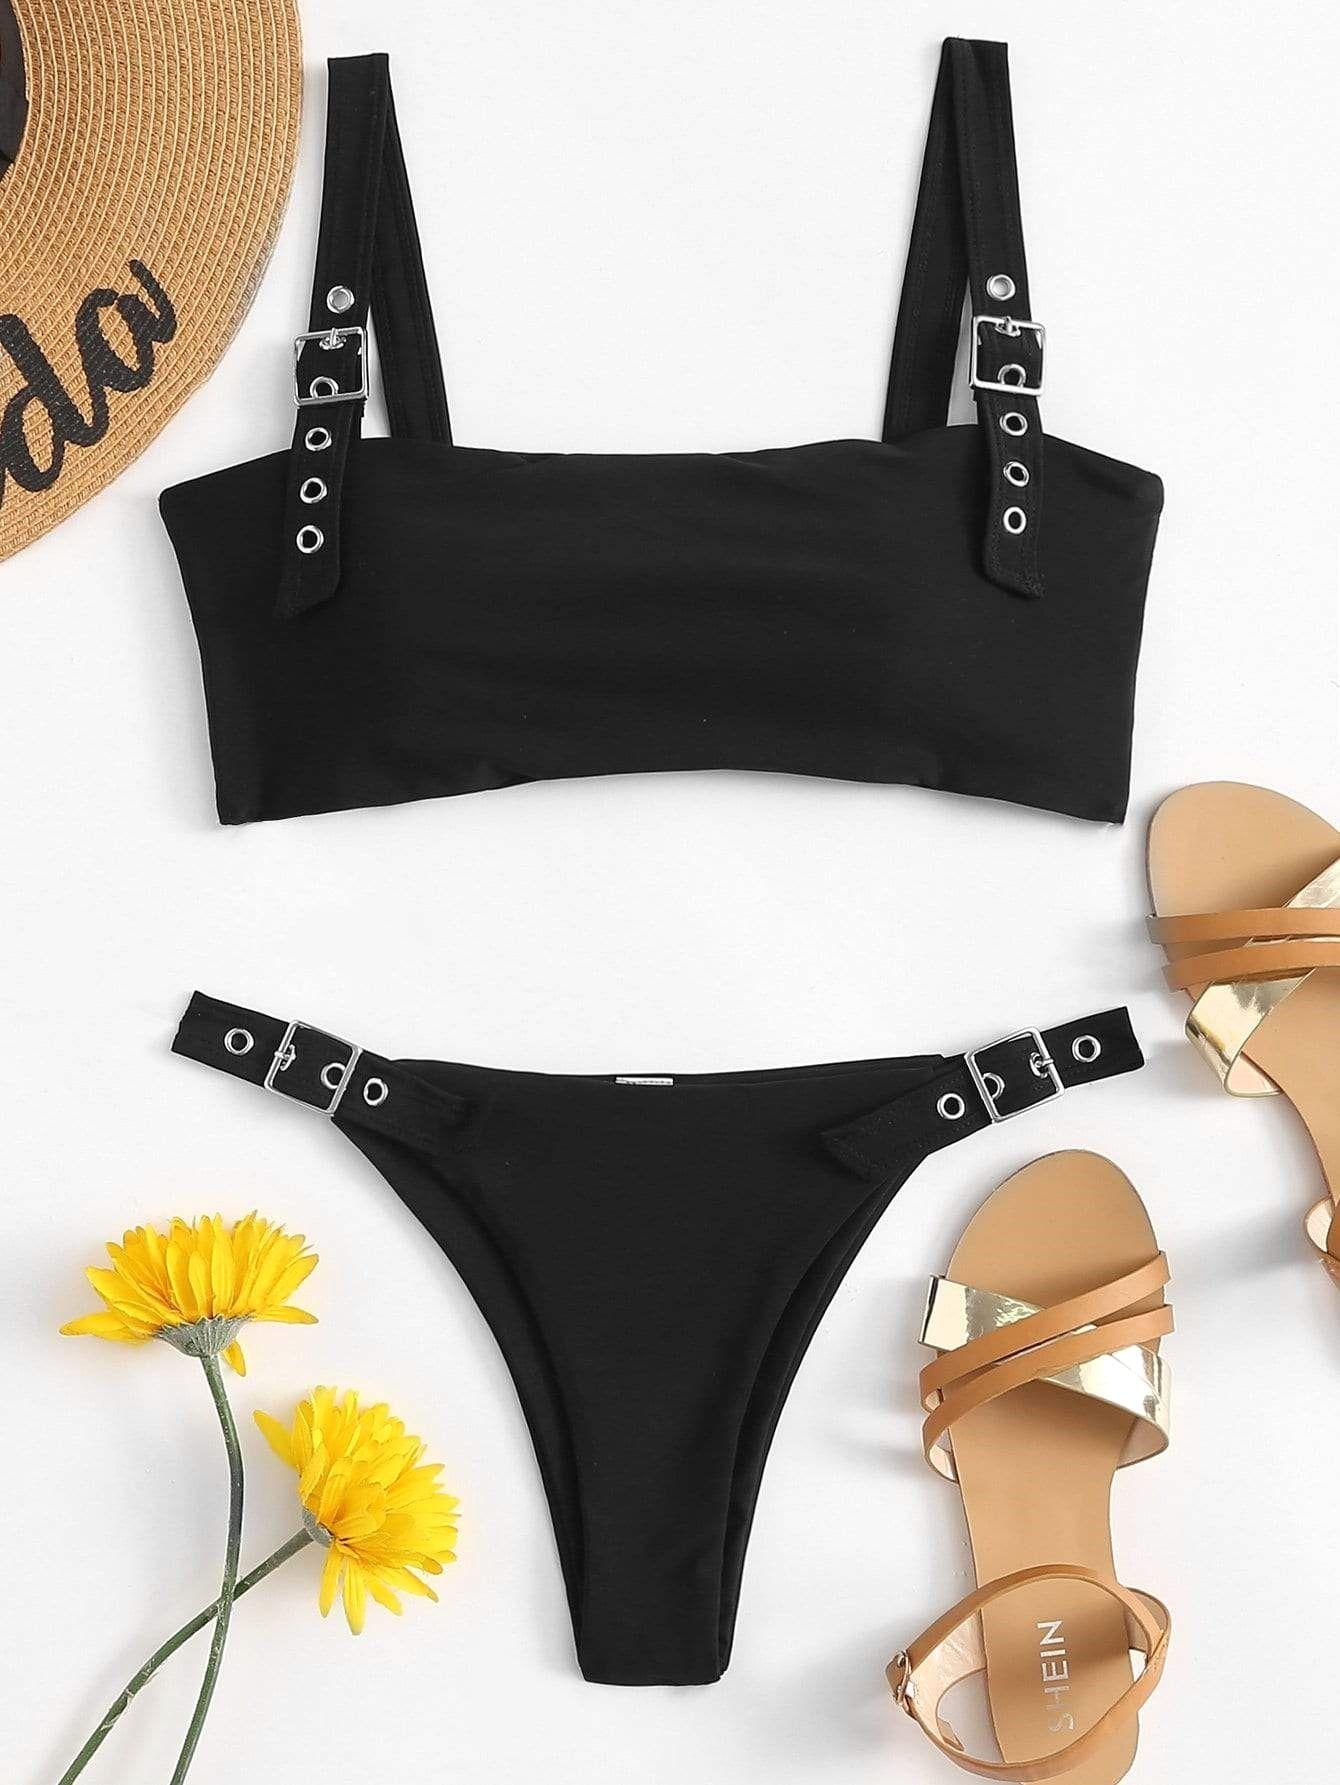 ef5e50c434 Buckle Top and High Leg Bikini Set in 2019 | Bathing Suits | Bikinis, High  leg bikini, Swimwear